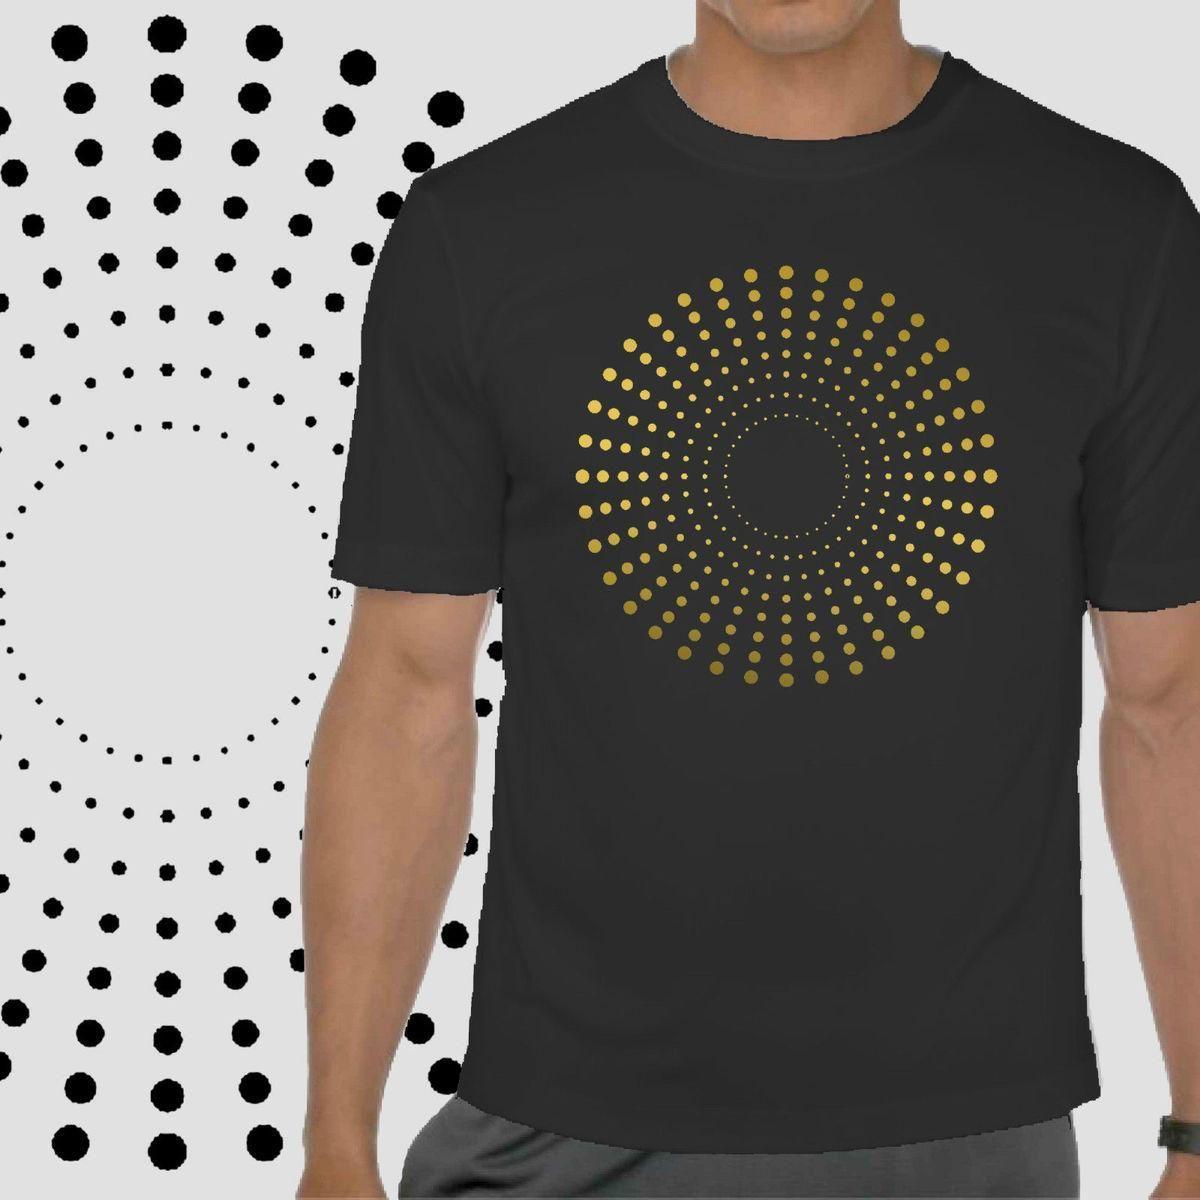 078b44409 Mandala Tshirt Sacred Geometry Mens Geometic Yoga Tee Indie T Hipster  Tshirt Funny Tees Funny T Shirts For Women From Lijian84, $12.08  DHgate.Com